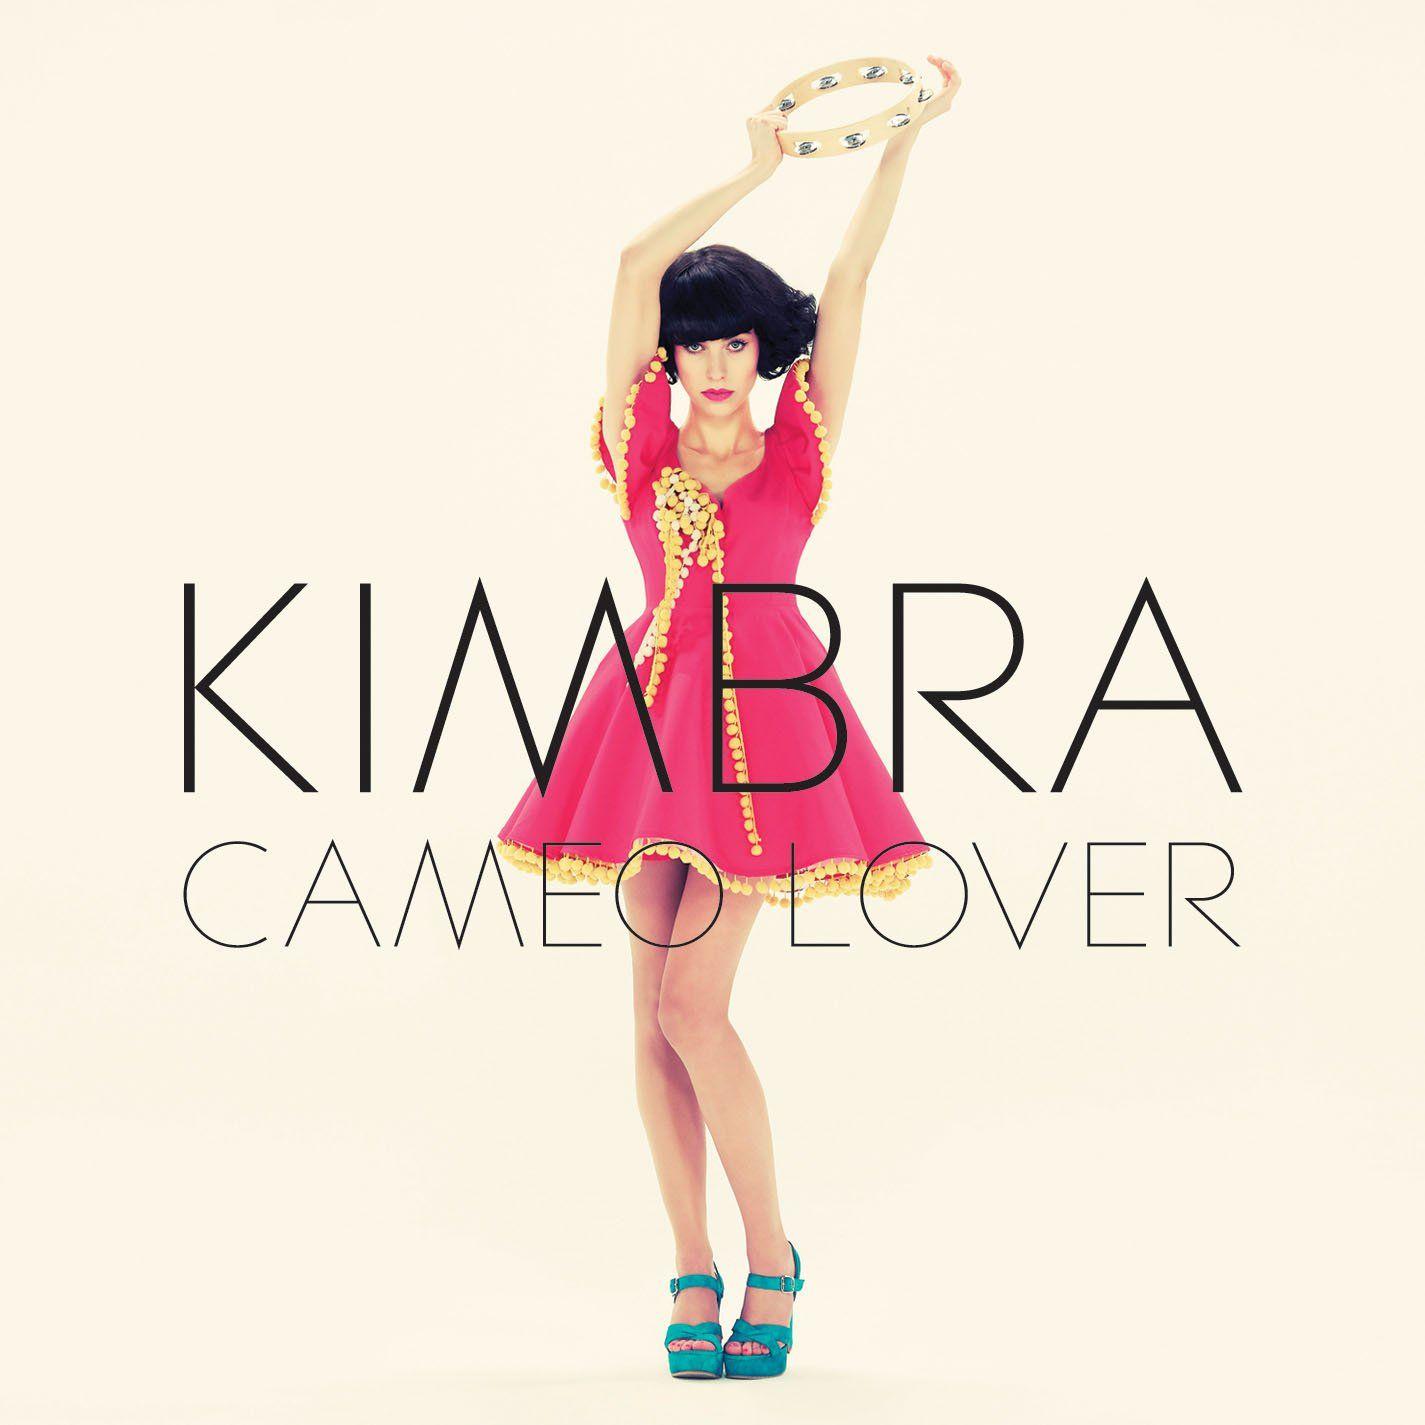 KIMBRA - CAMEO LOVER (2011)